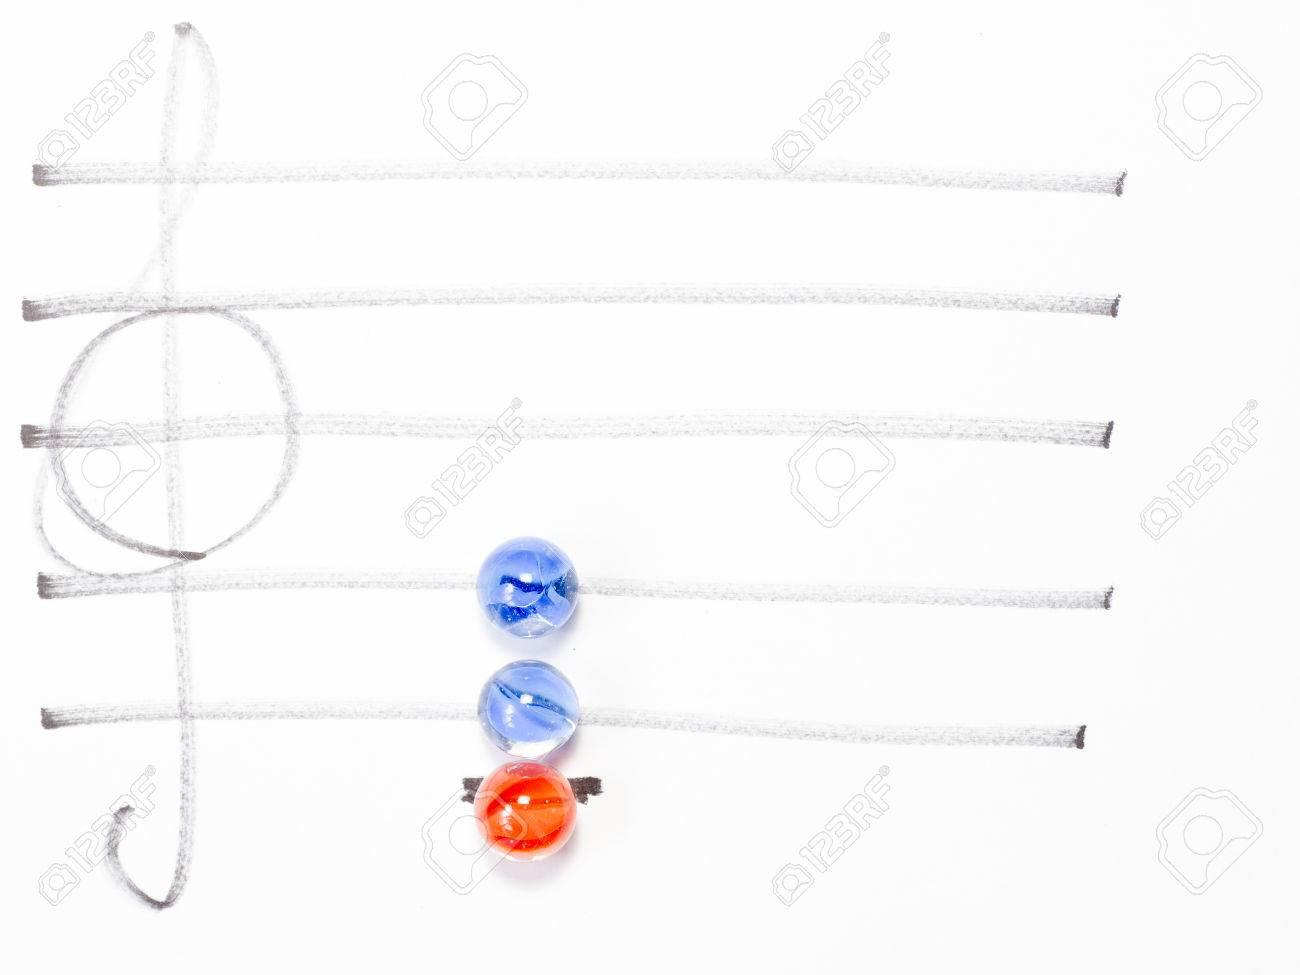 hight resolution of stock photo the series of chord diagram c on handwitten sheet music